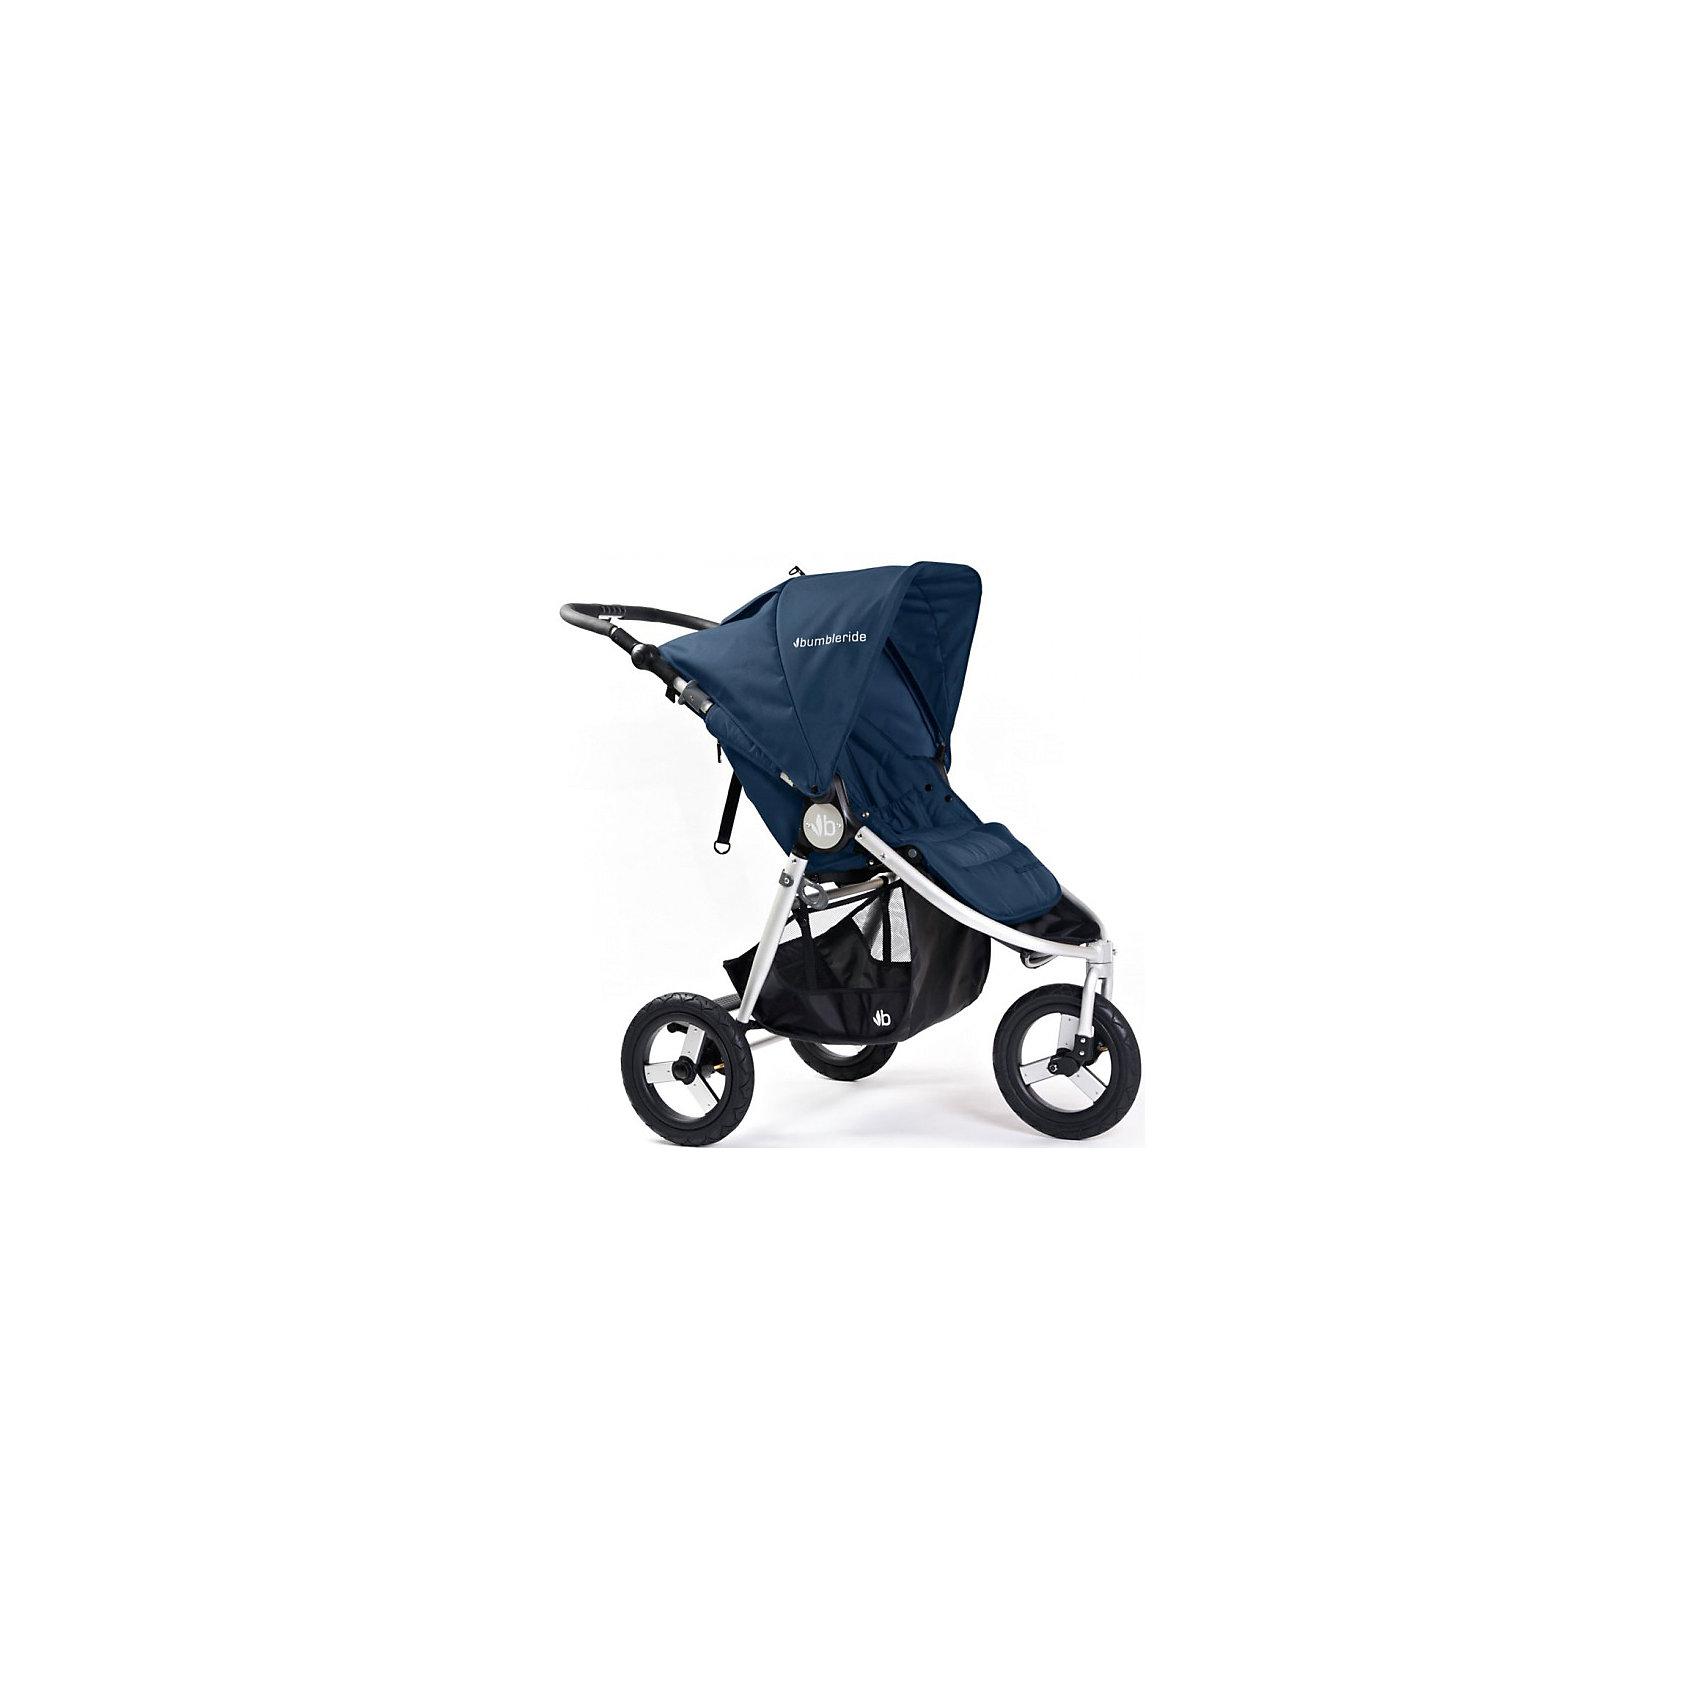 Bumbleride Прогулочная коляска Indie, Bumbleride , maritime blue прогулочная коляска прогулочная коляска bumbleride indie maritime blue